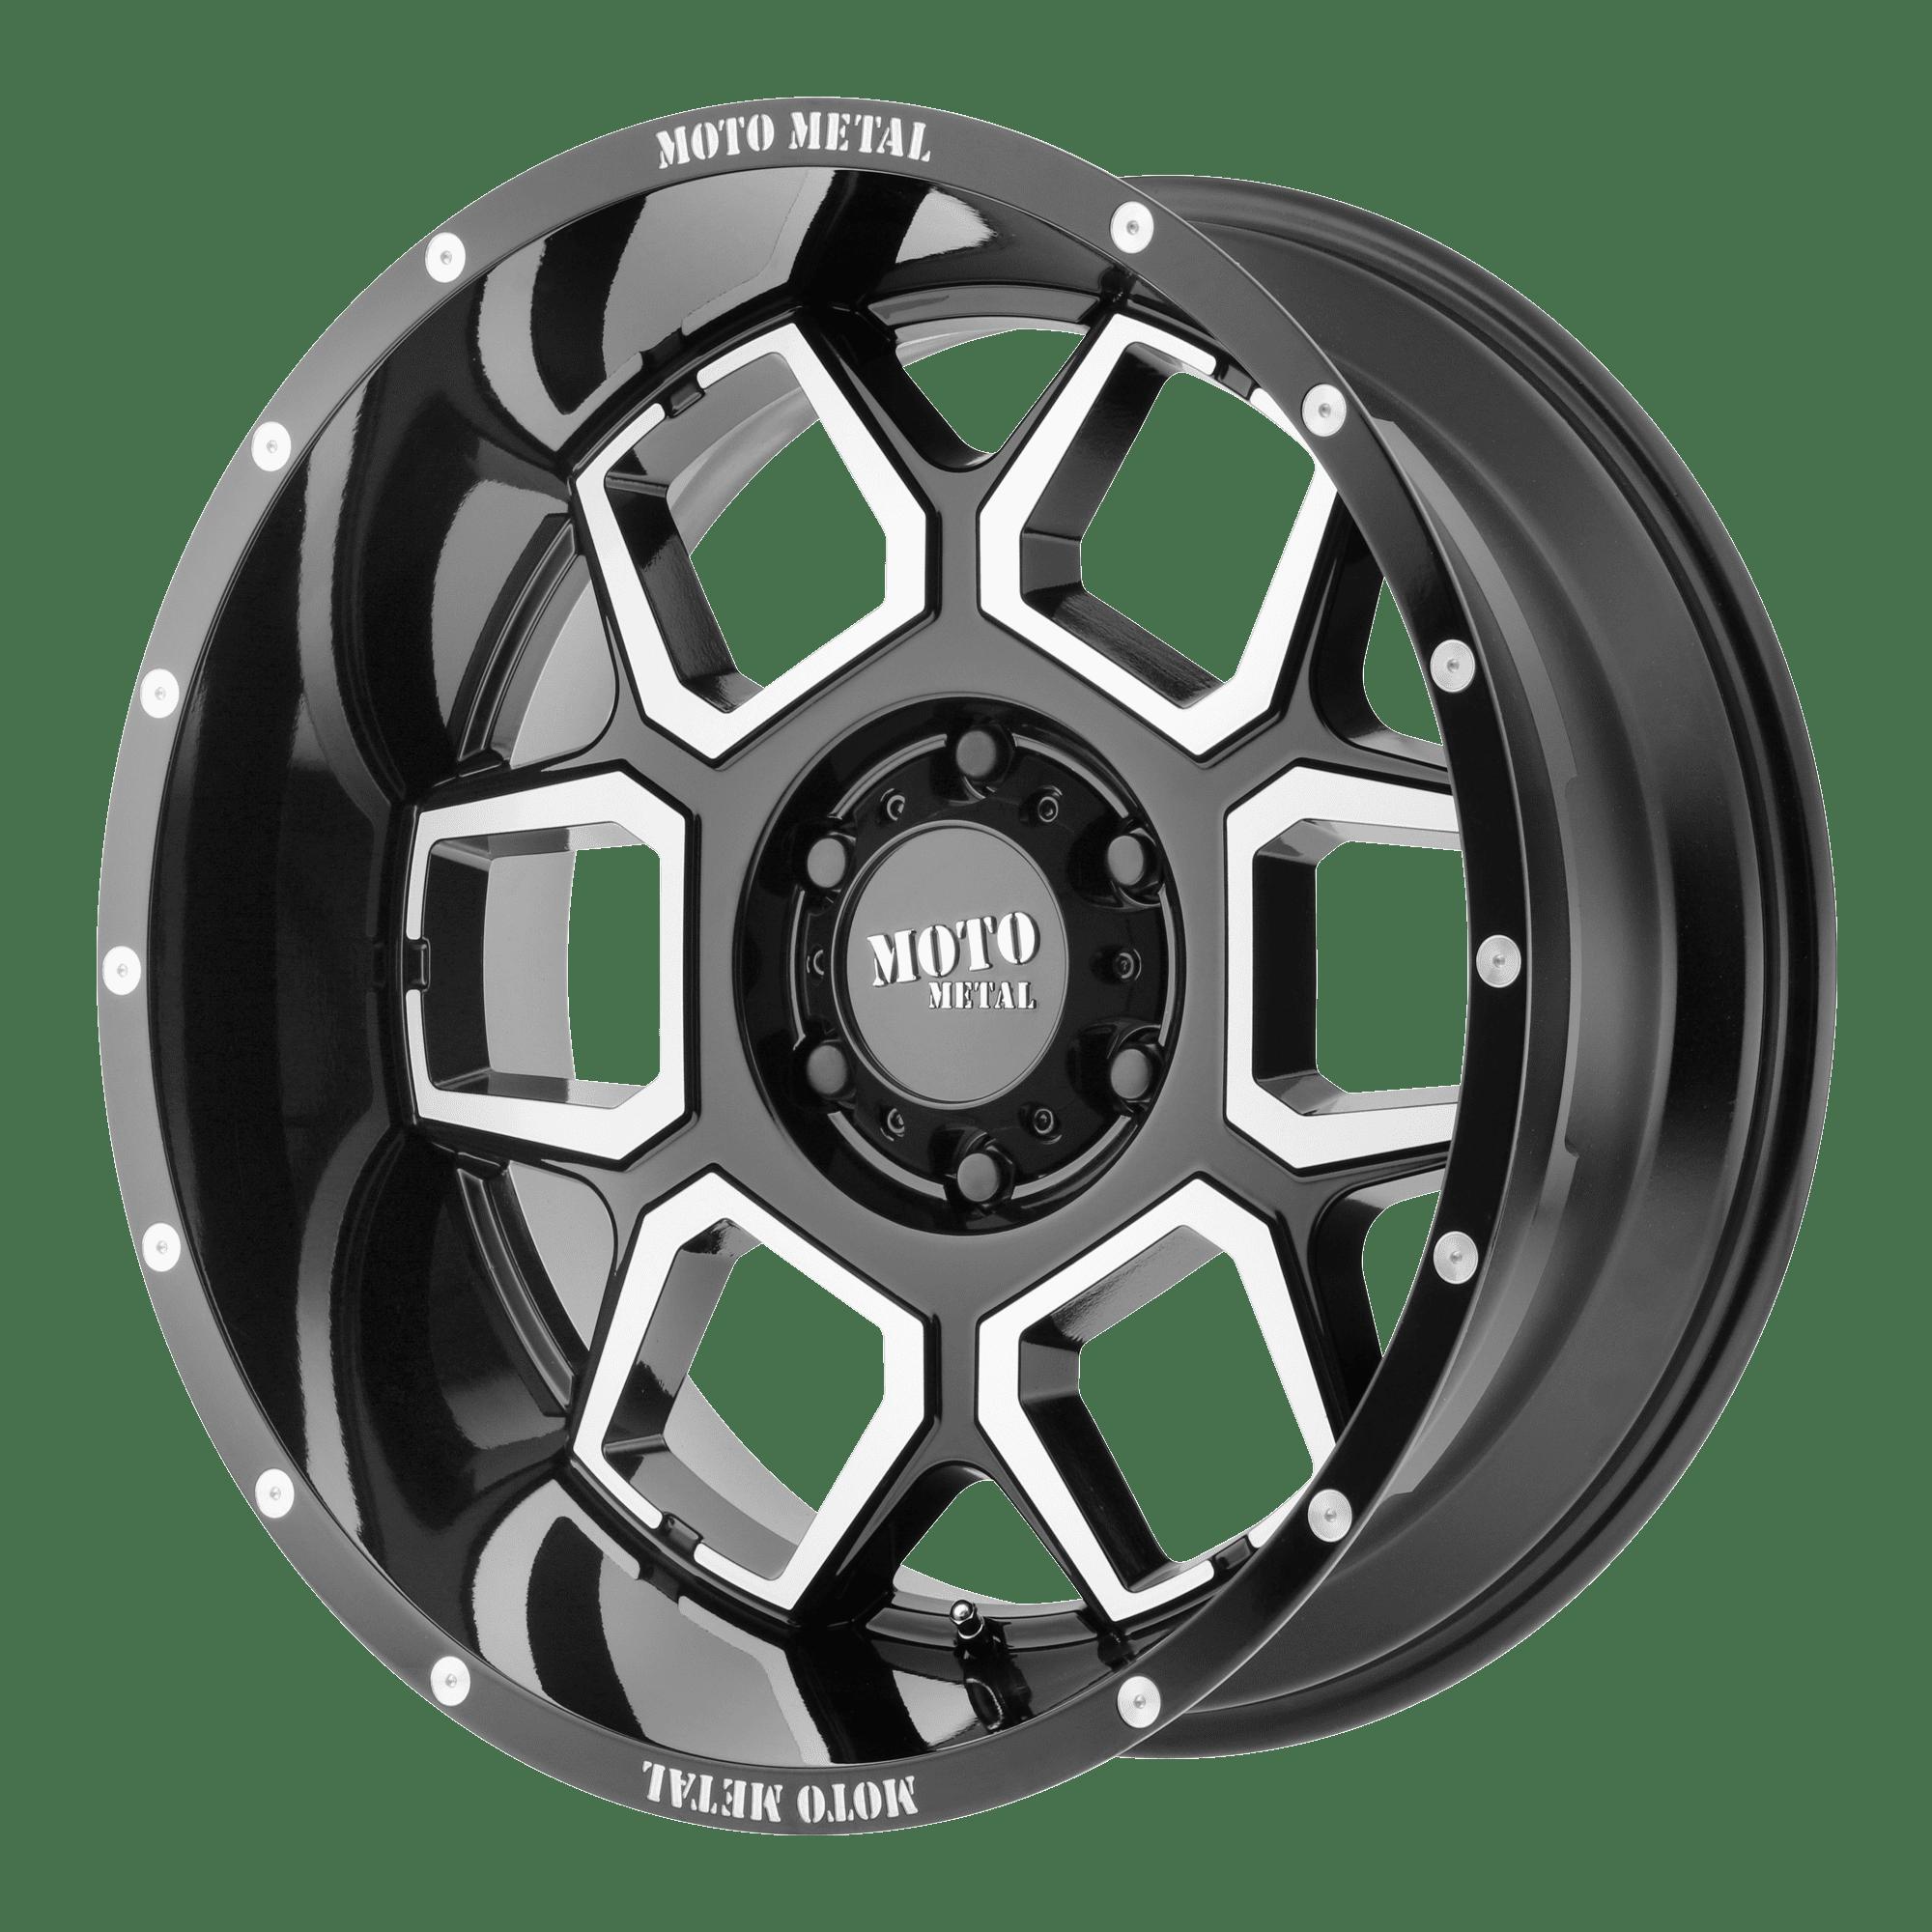 MOTO METAL SPADE 20x10 5x127.00 BLACK (-24 mm) RIM